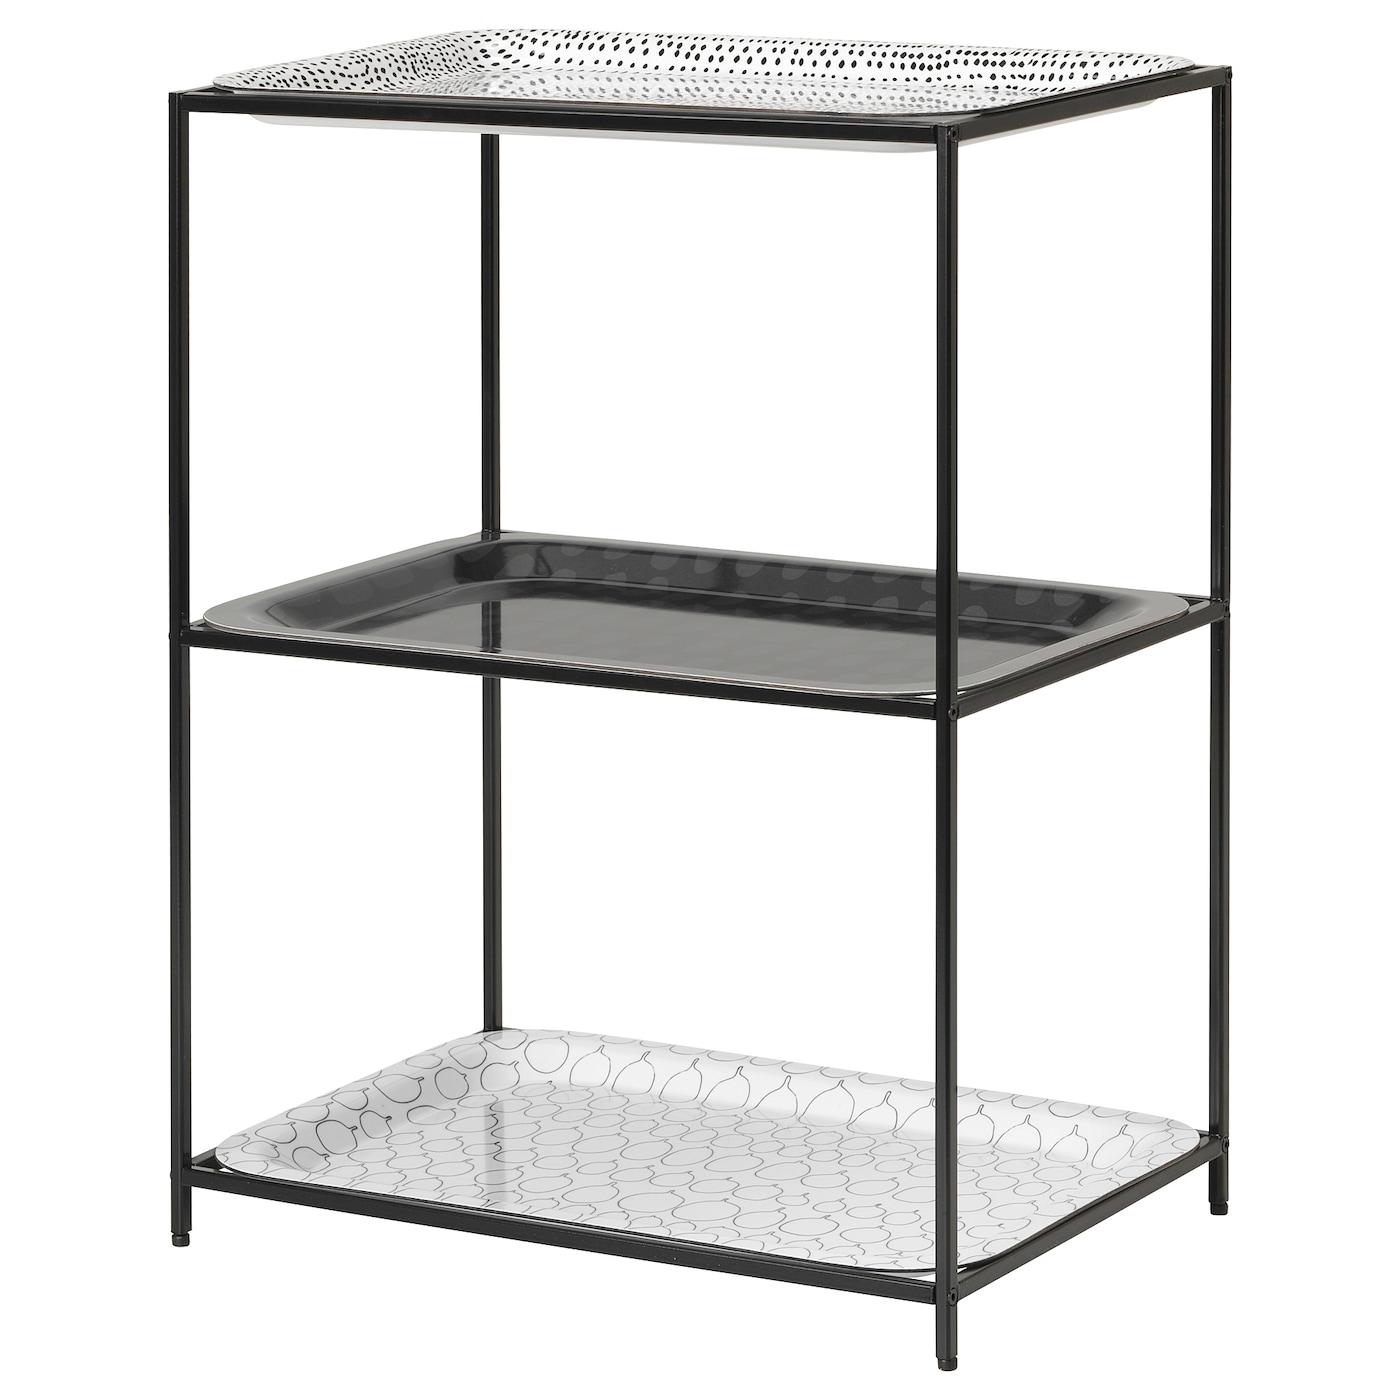 Ikea Sammanhang Tray Stand With Trays